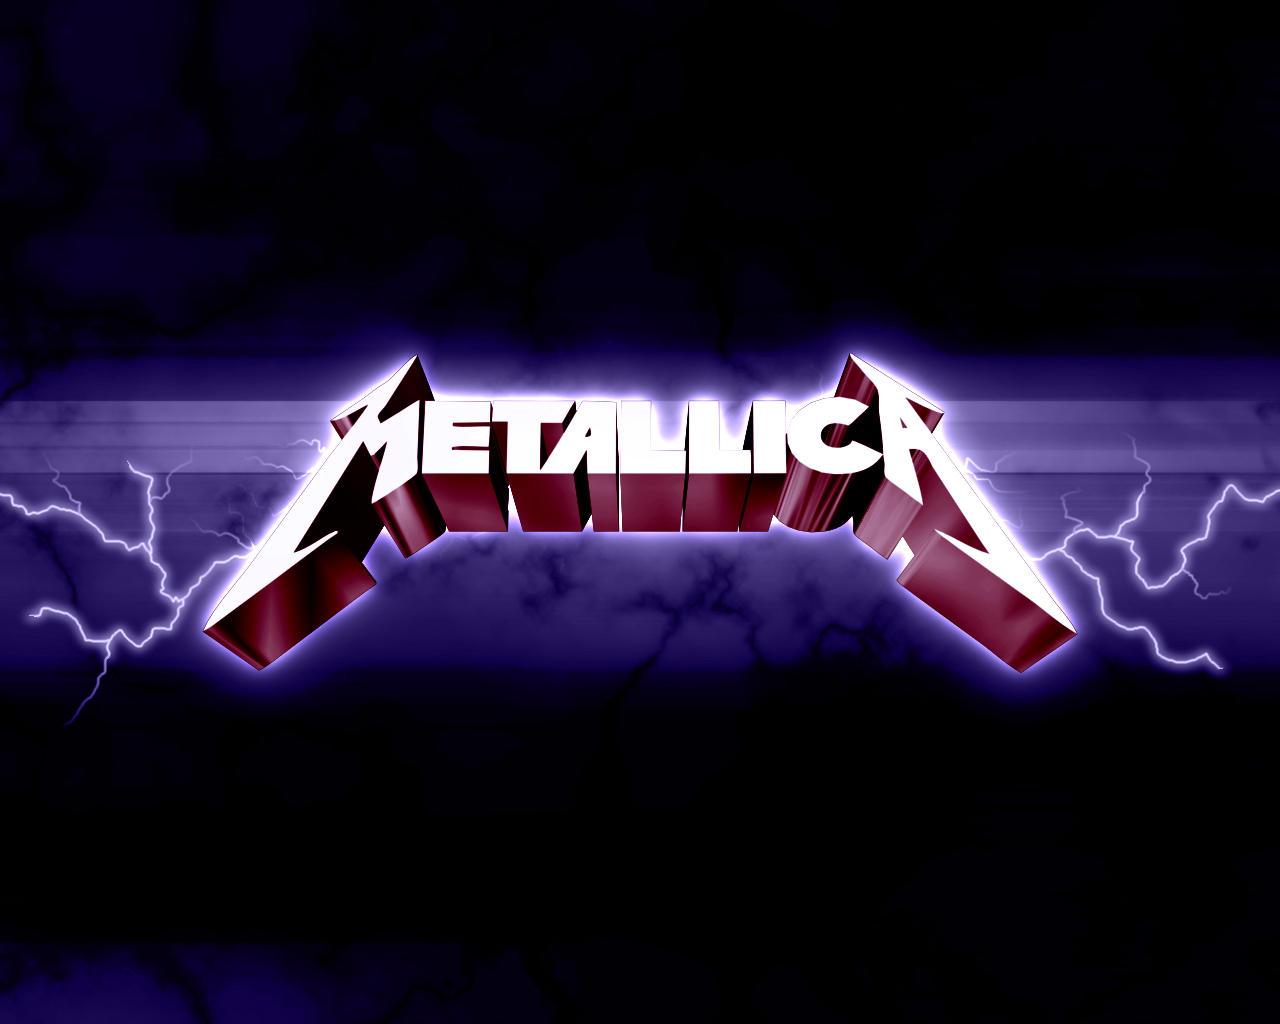 Metallica wallpaper by viRioL on DeviantArt